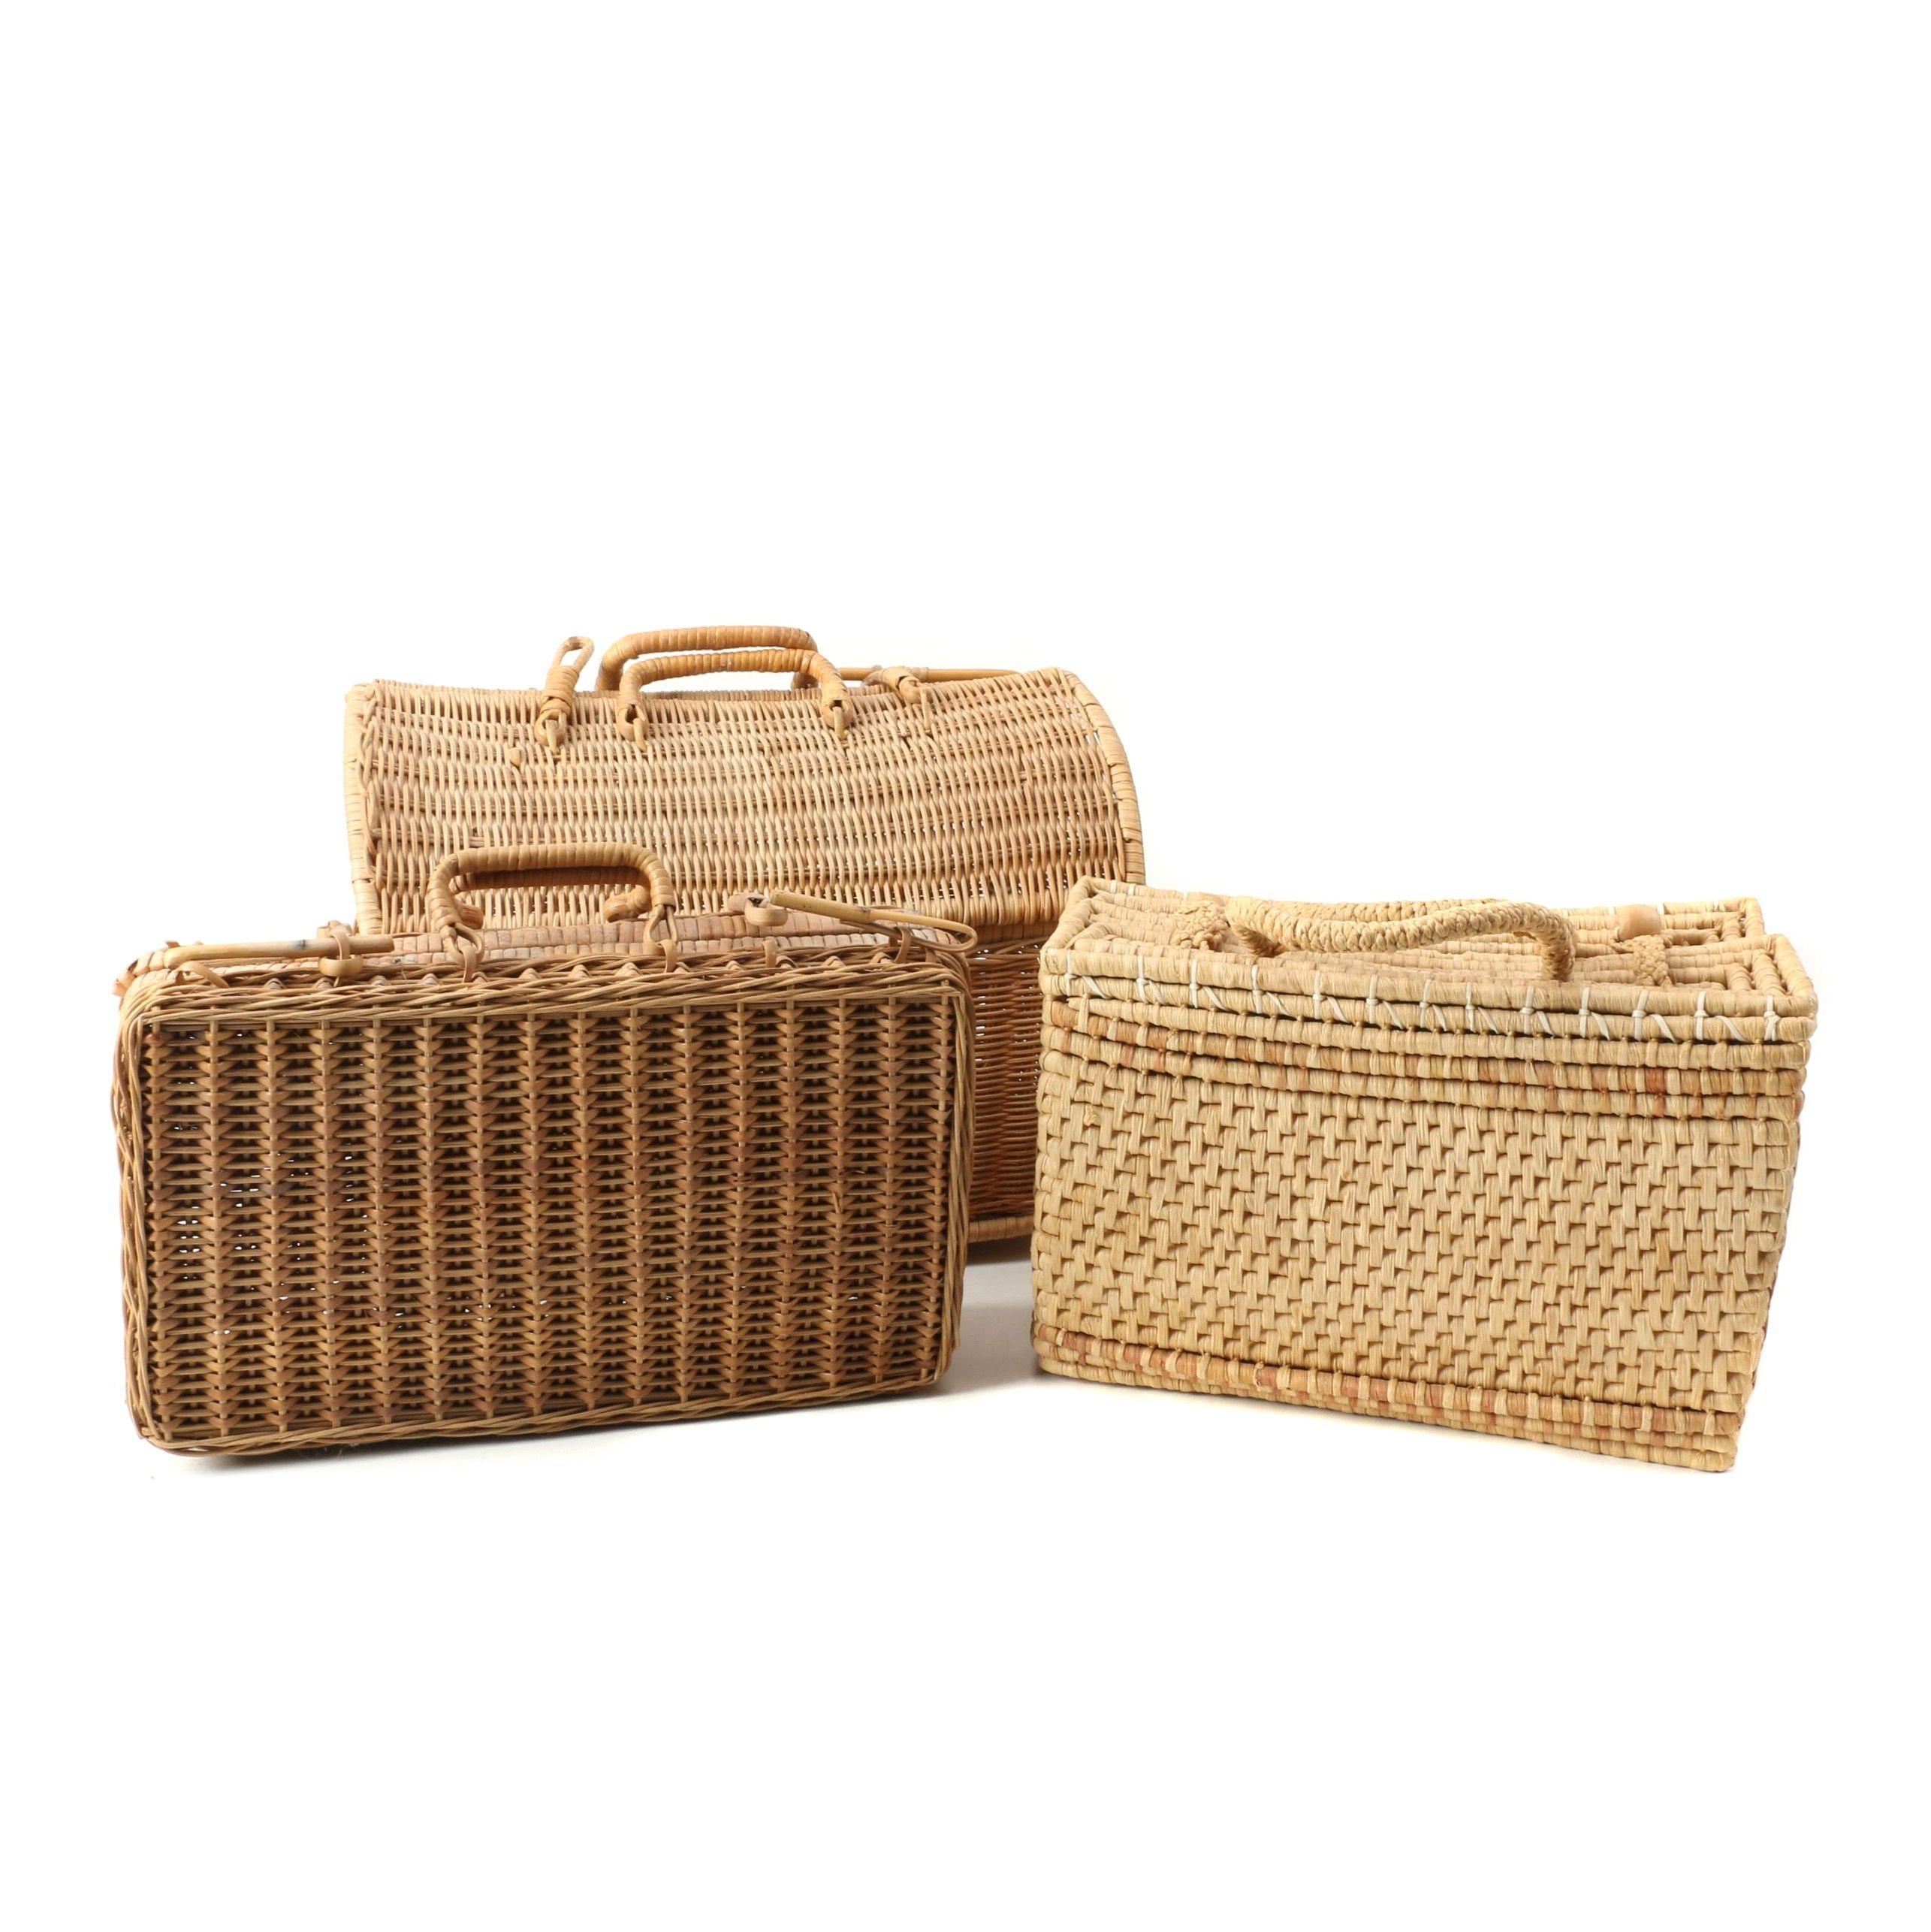 Woven Handled Picnic Baskets